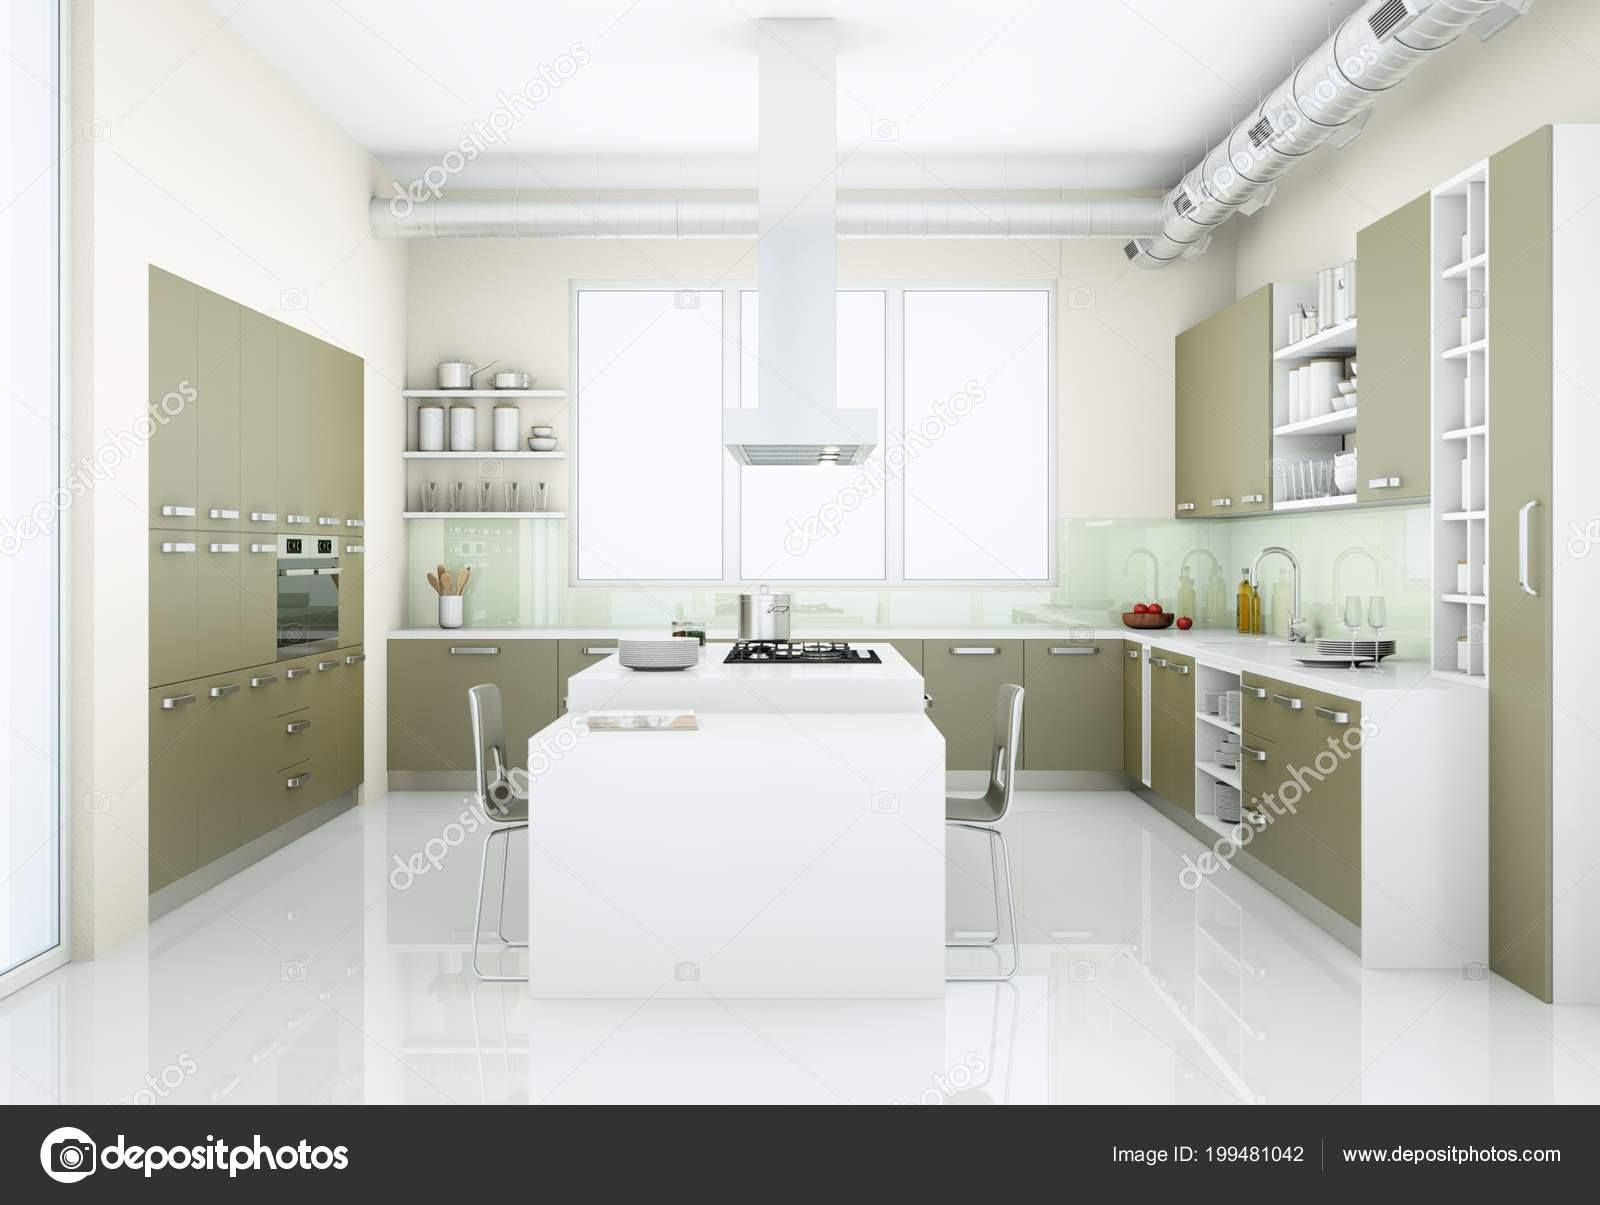 Grijze Moderne Keuken : Grijze moderne keuken in hok met grote ramen u2014 stockfoto © virtua73